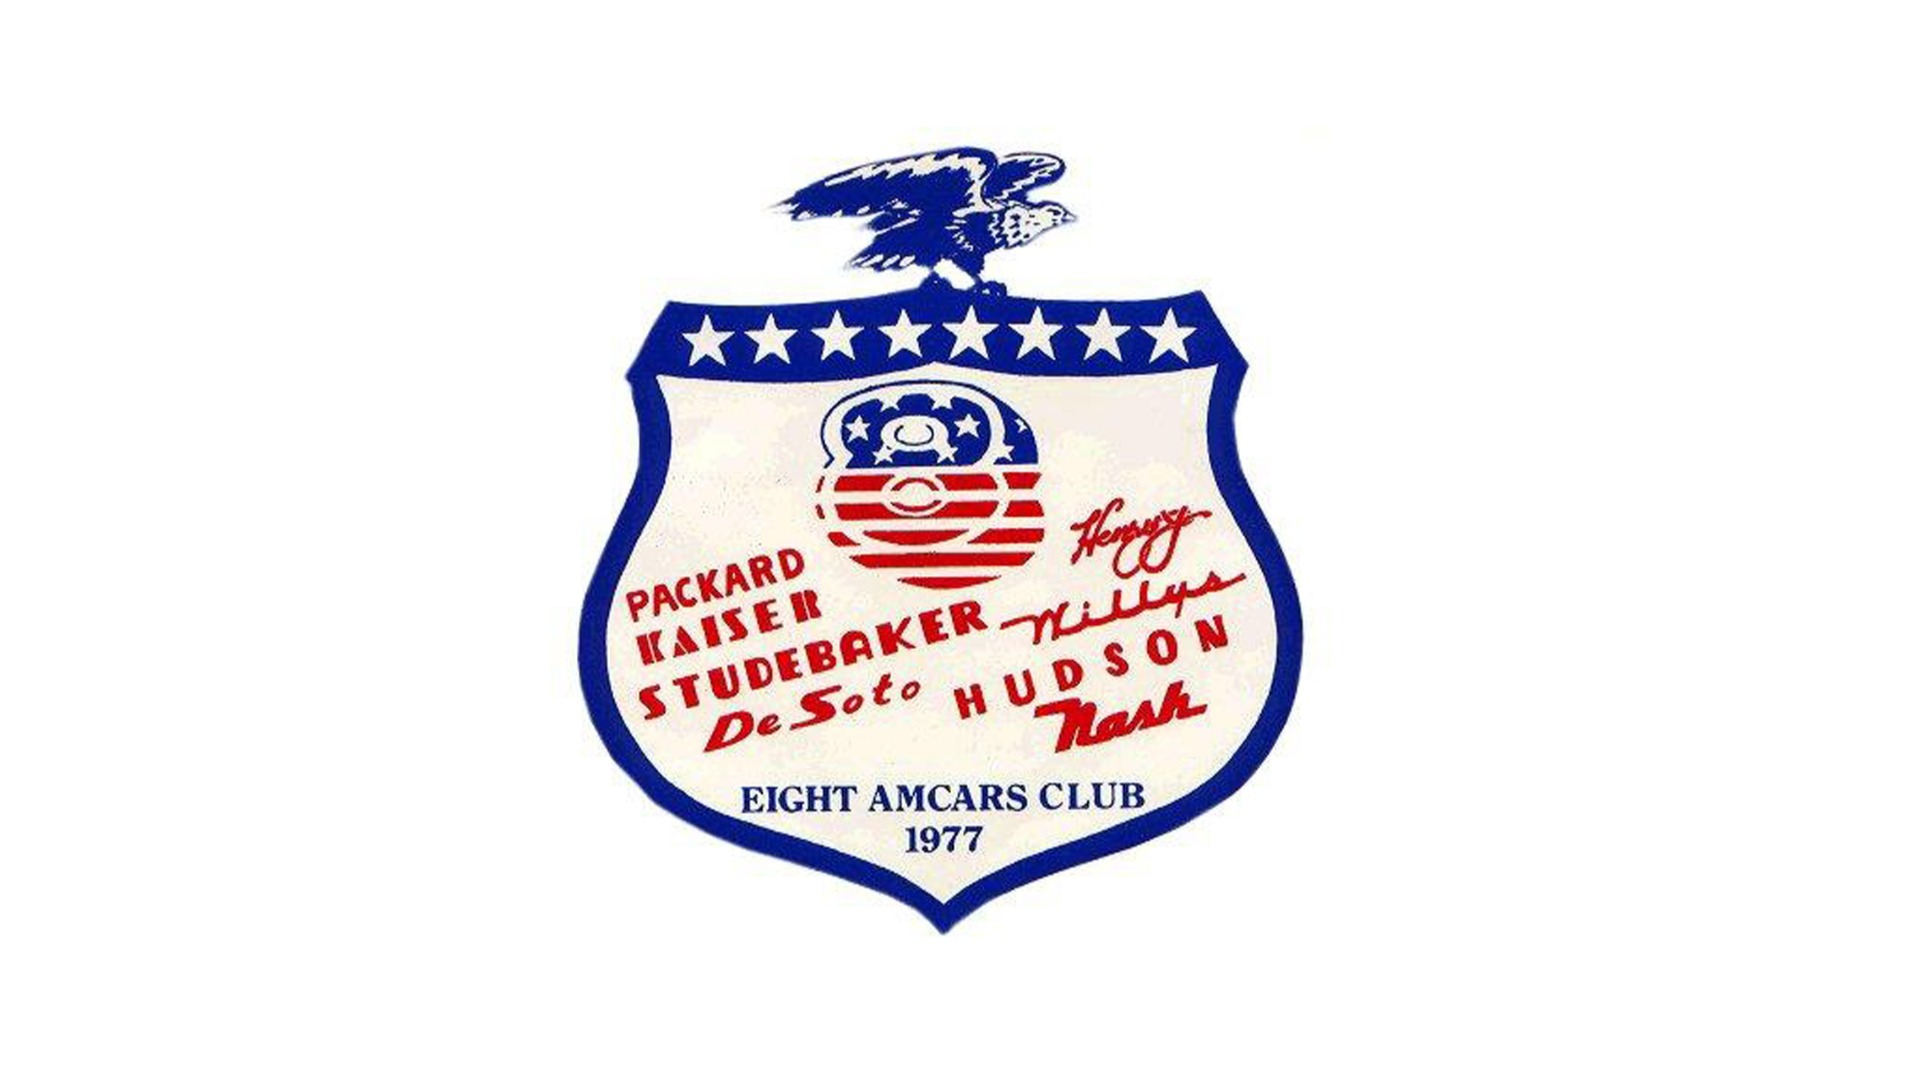 Eight+amcars+club-Fullskjerm.jpg